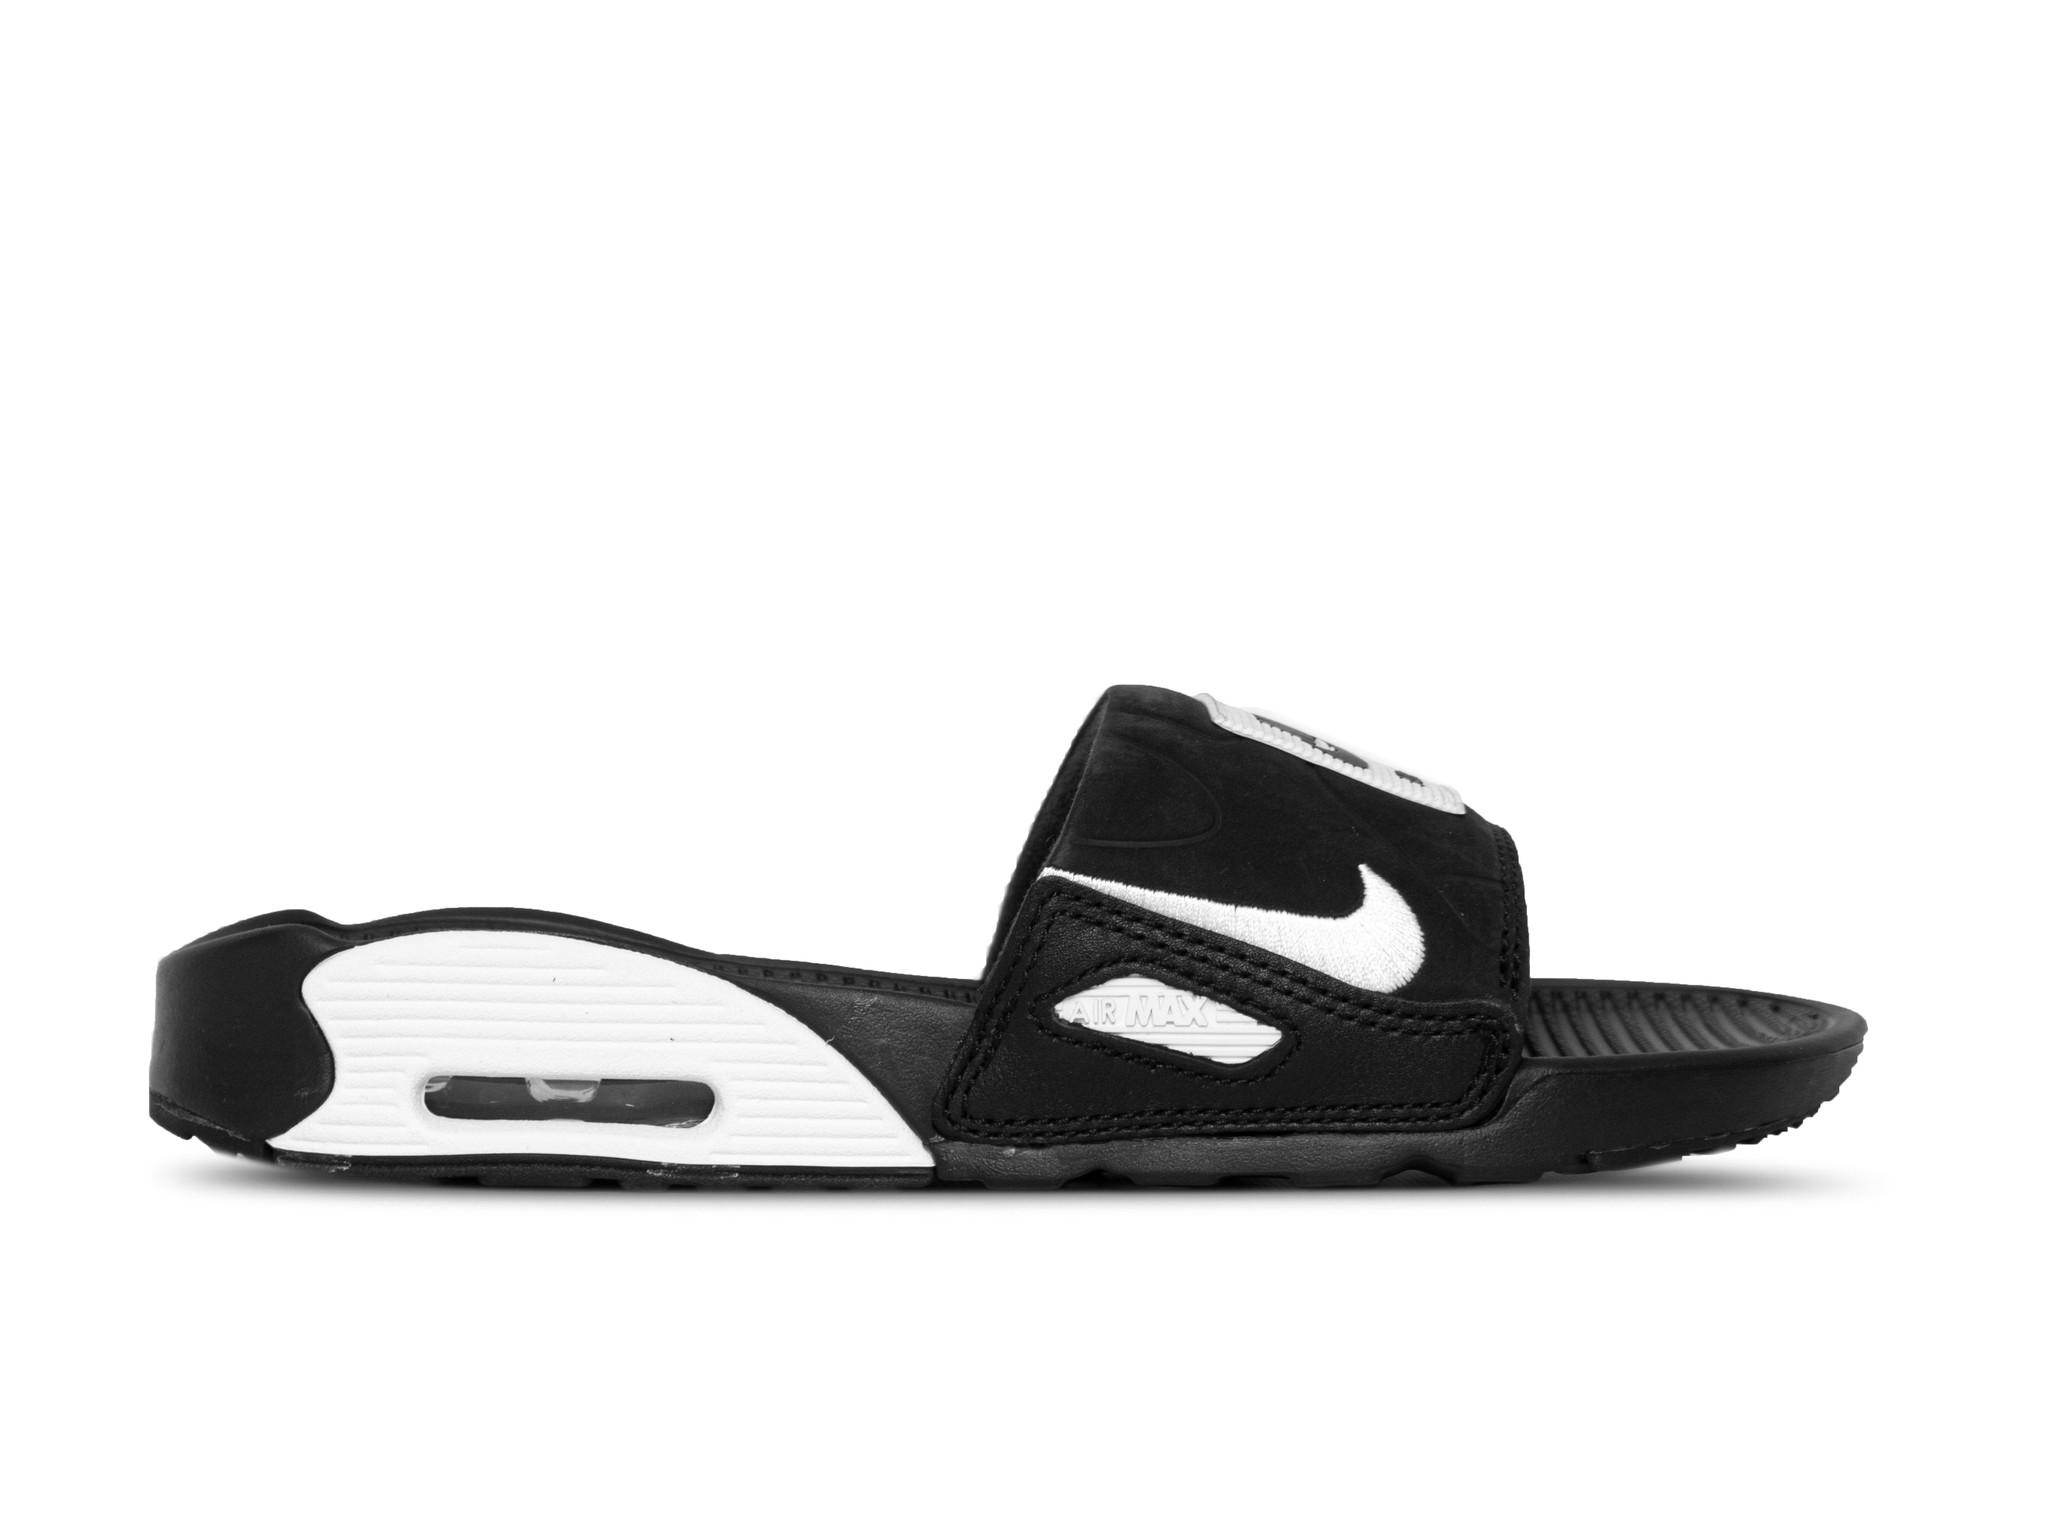 Nike Air Max 90 Slipper voor heren